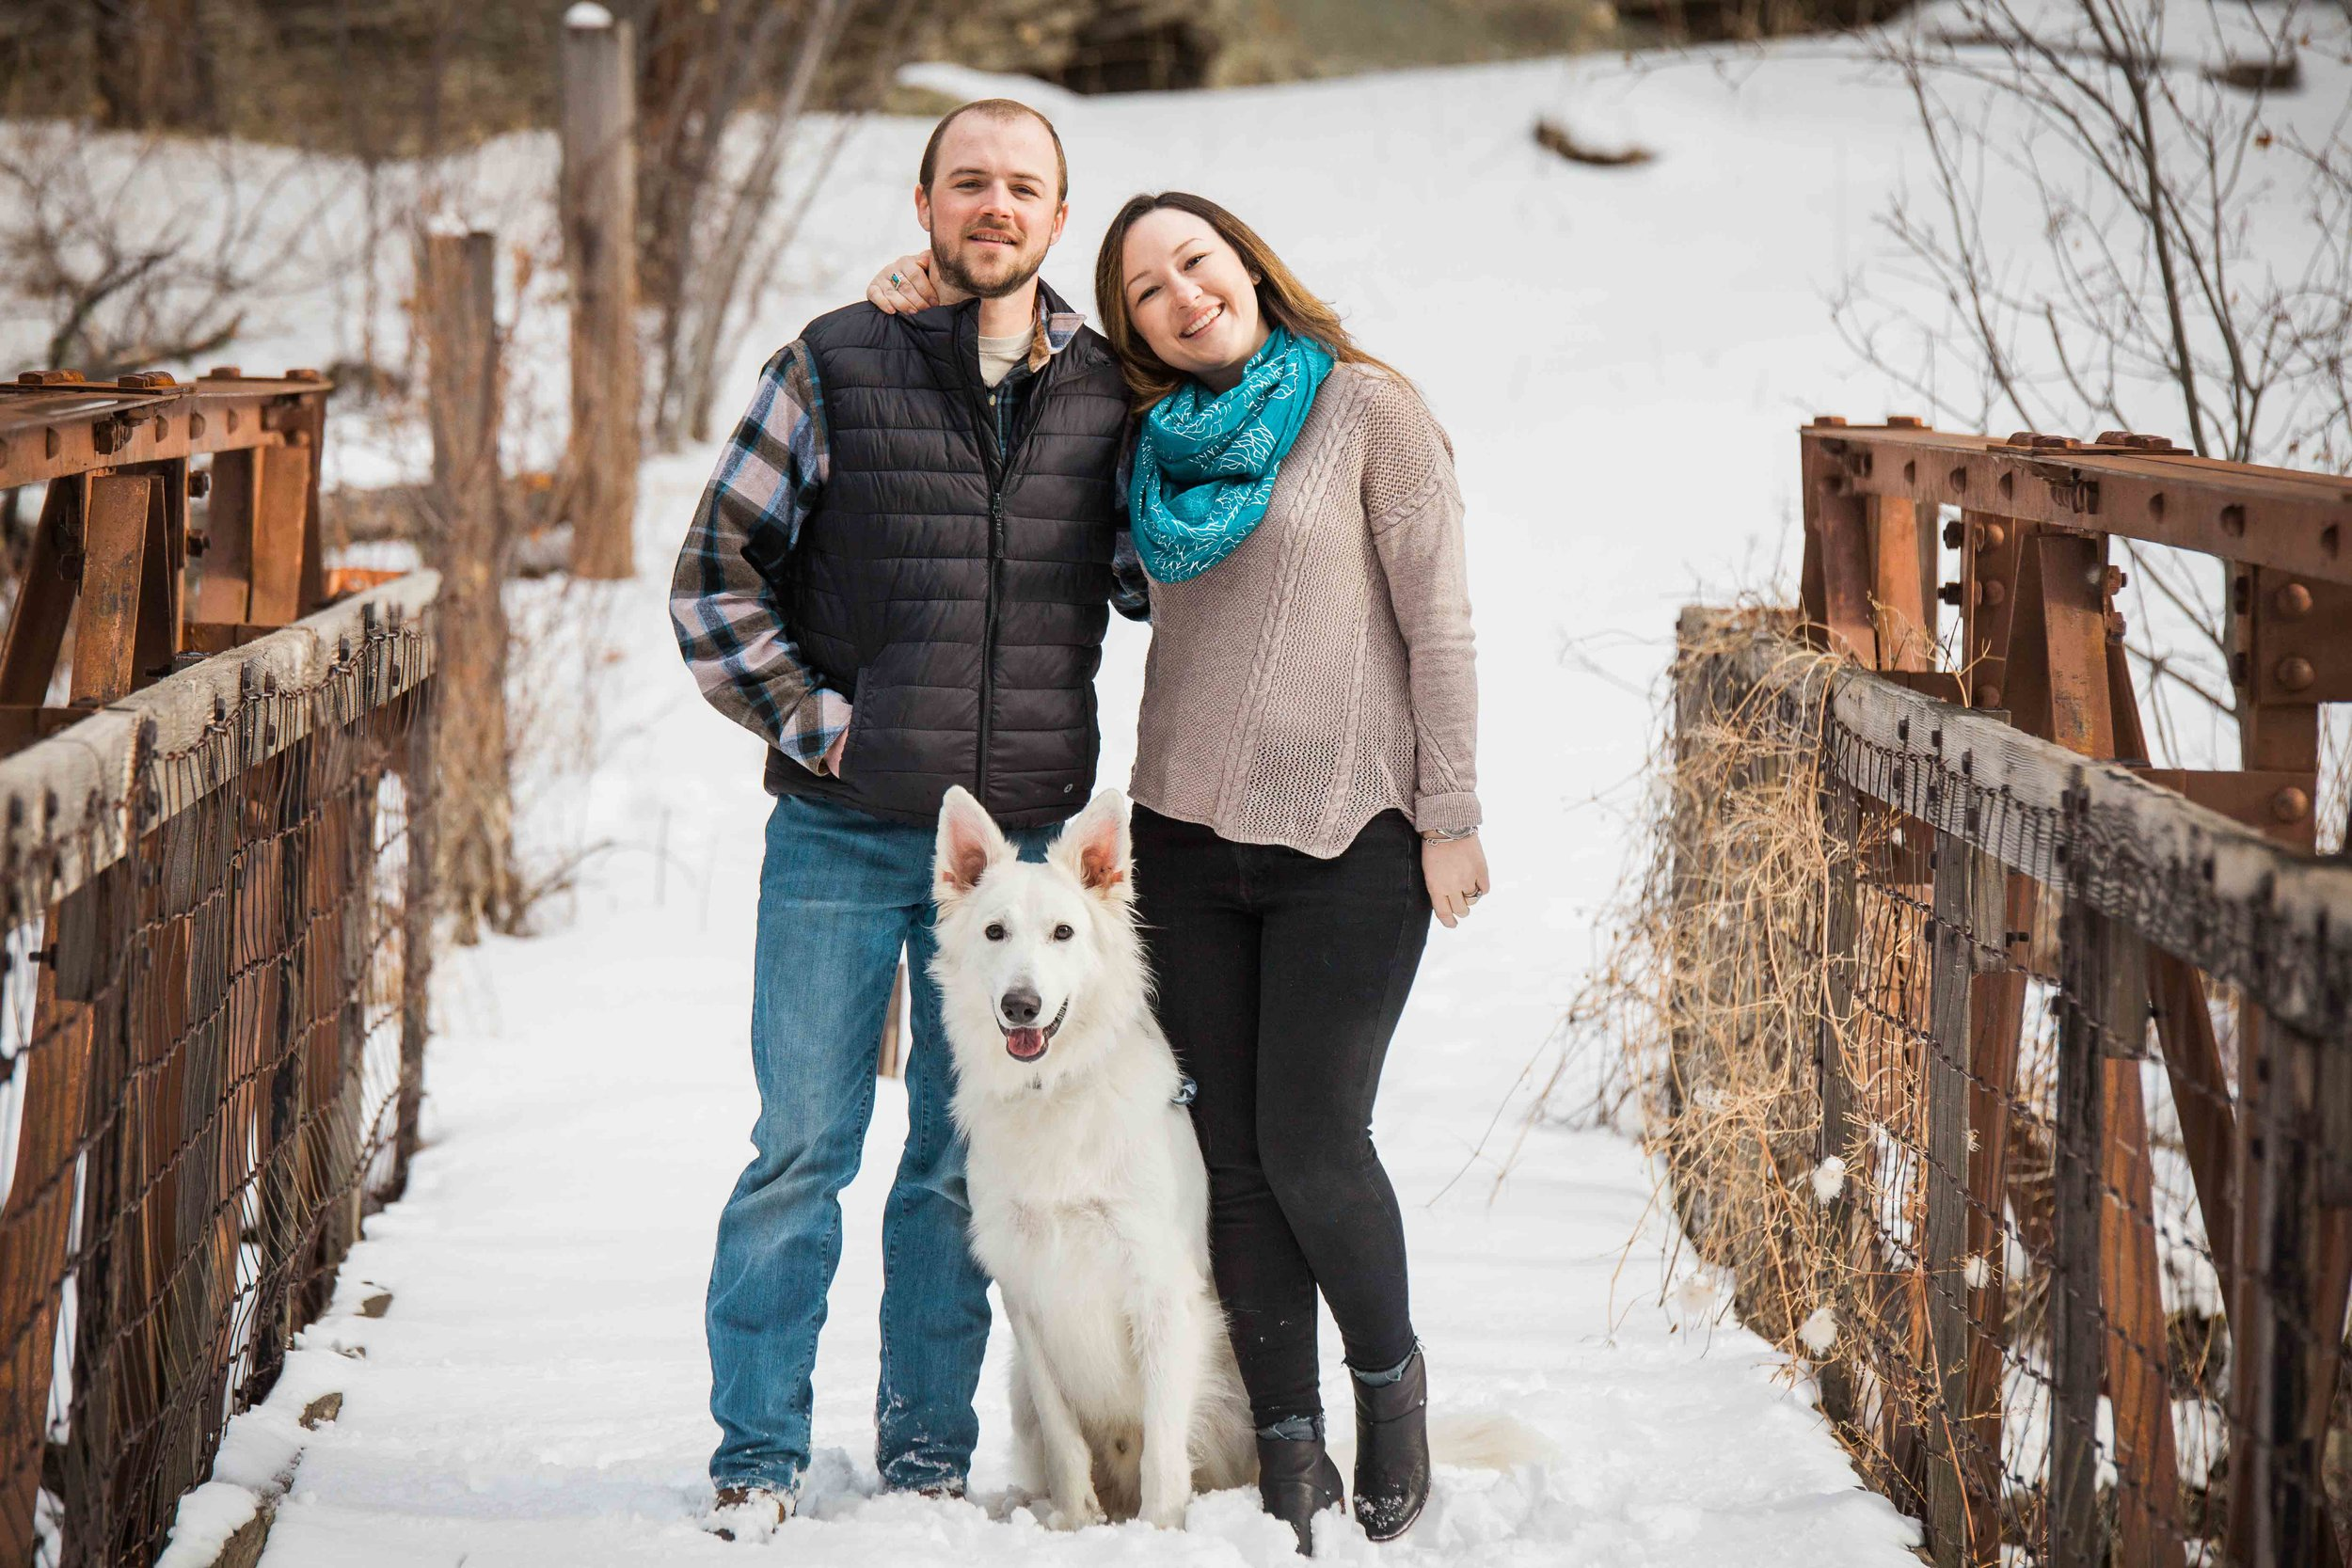 Kerns Photography - Sheridan Wyoming - Couples